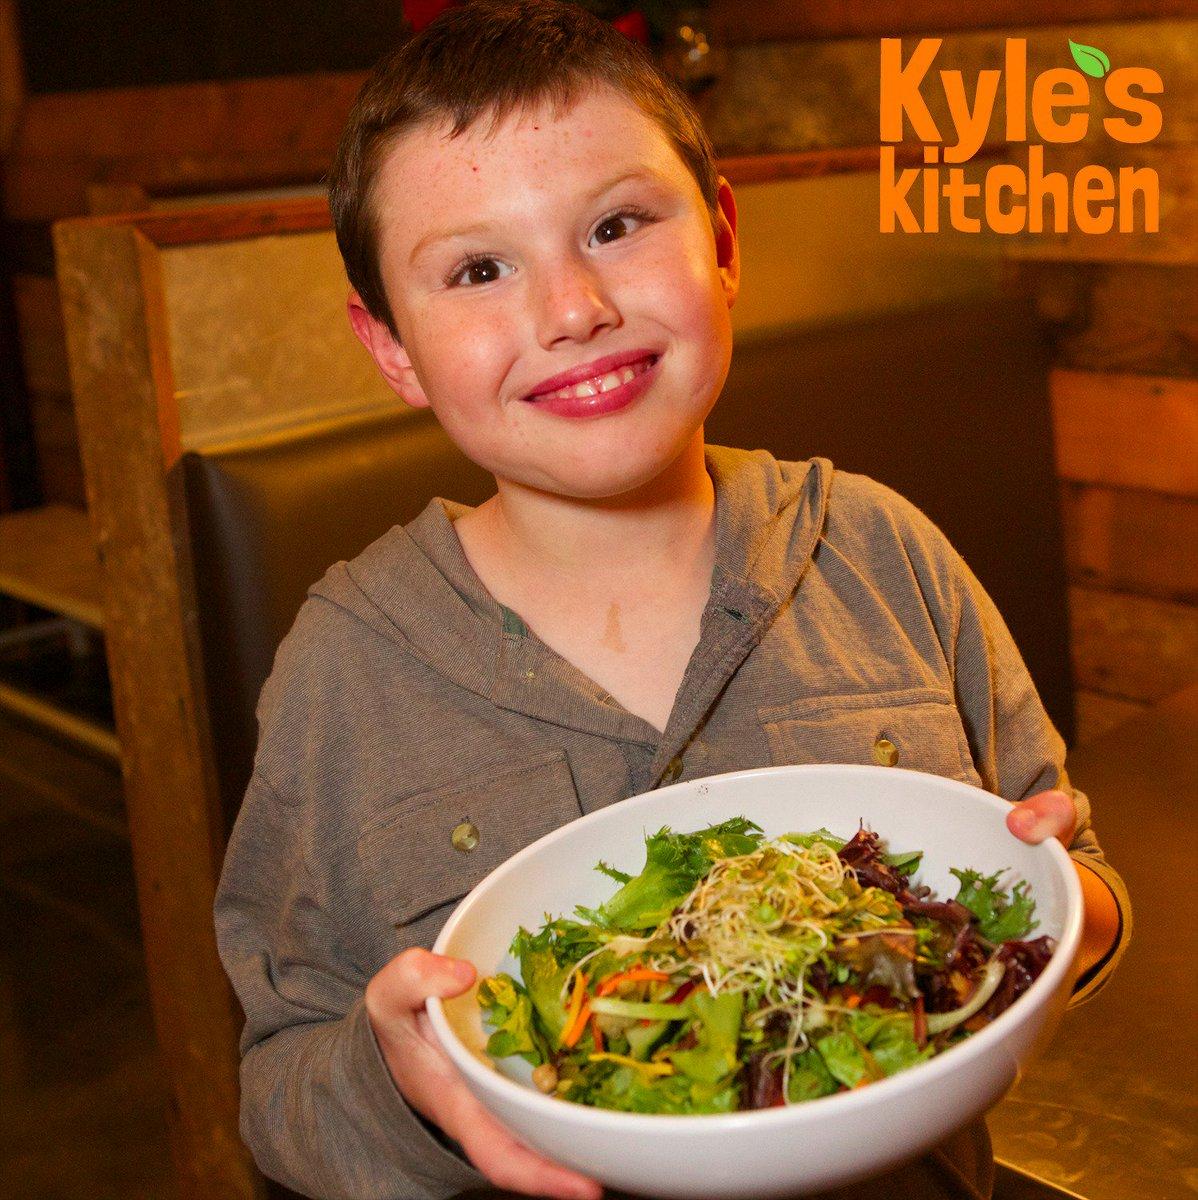 Kyle S Kitchen On Twitter Kyle S Favorite Menu Items